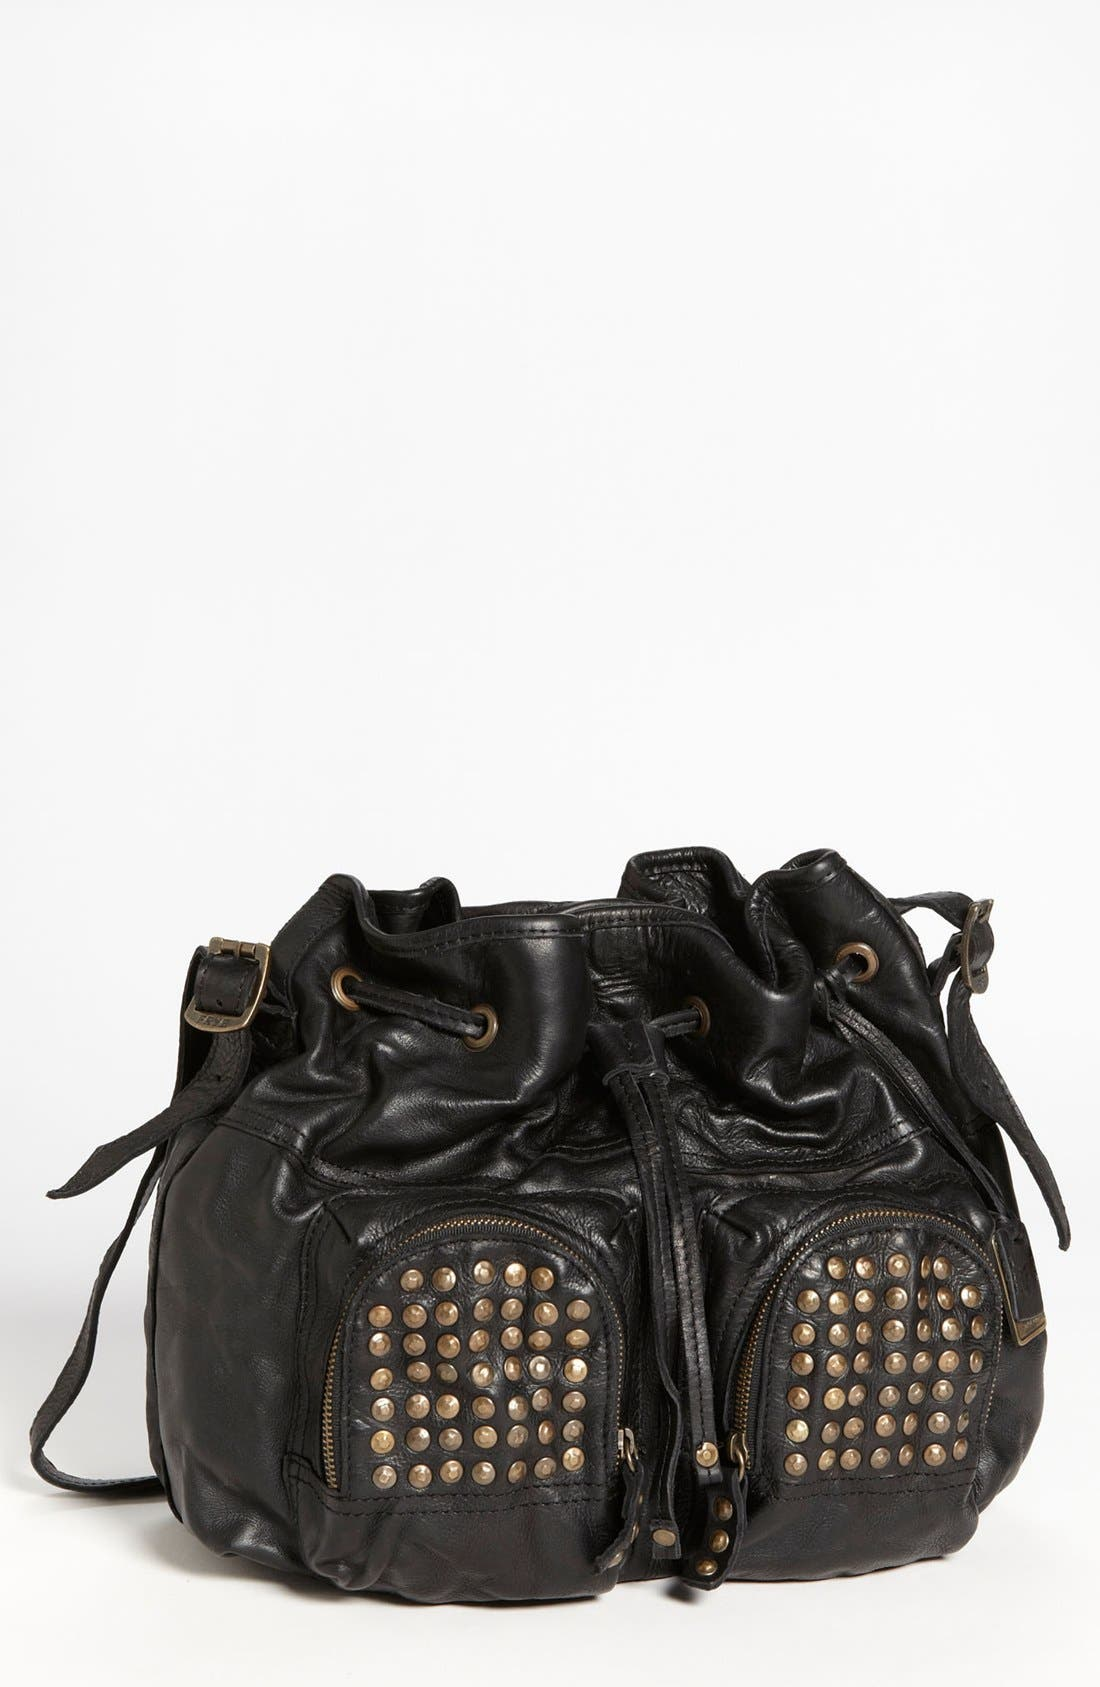 'Brooke' Drawstring Shoulder Bag, Medium, Main, color, 001